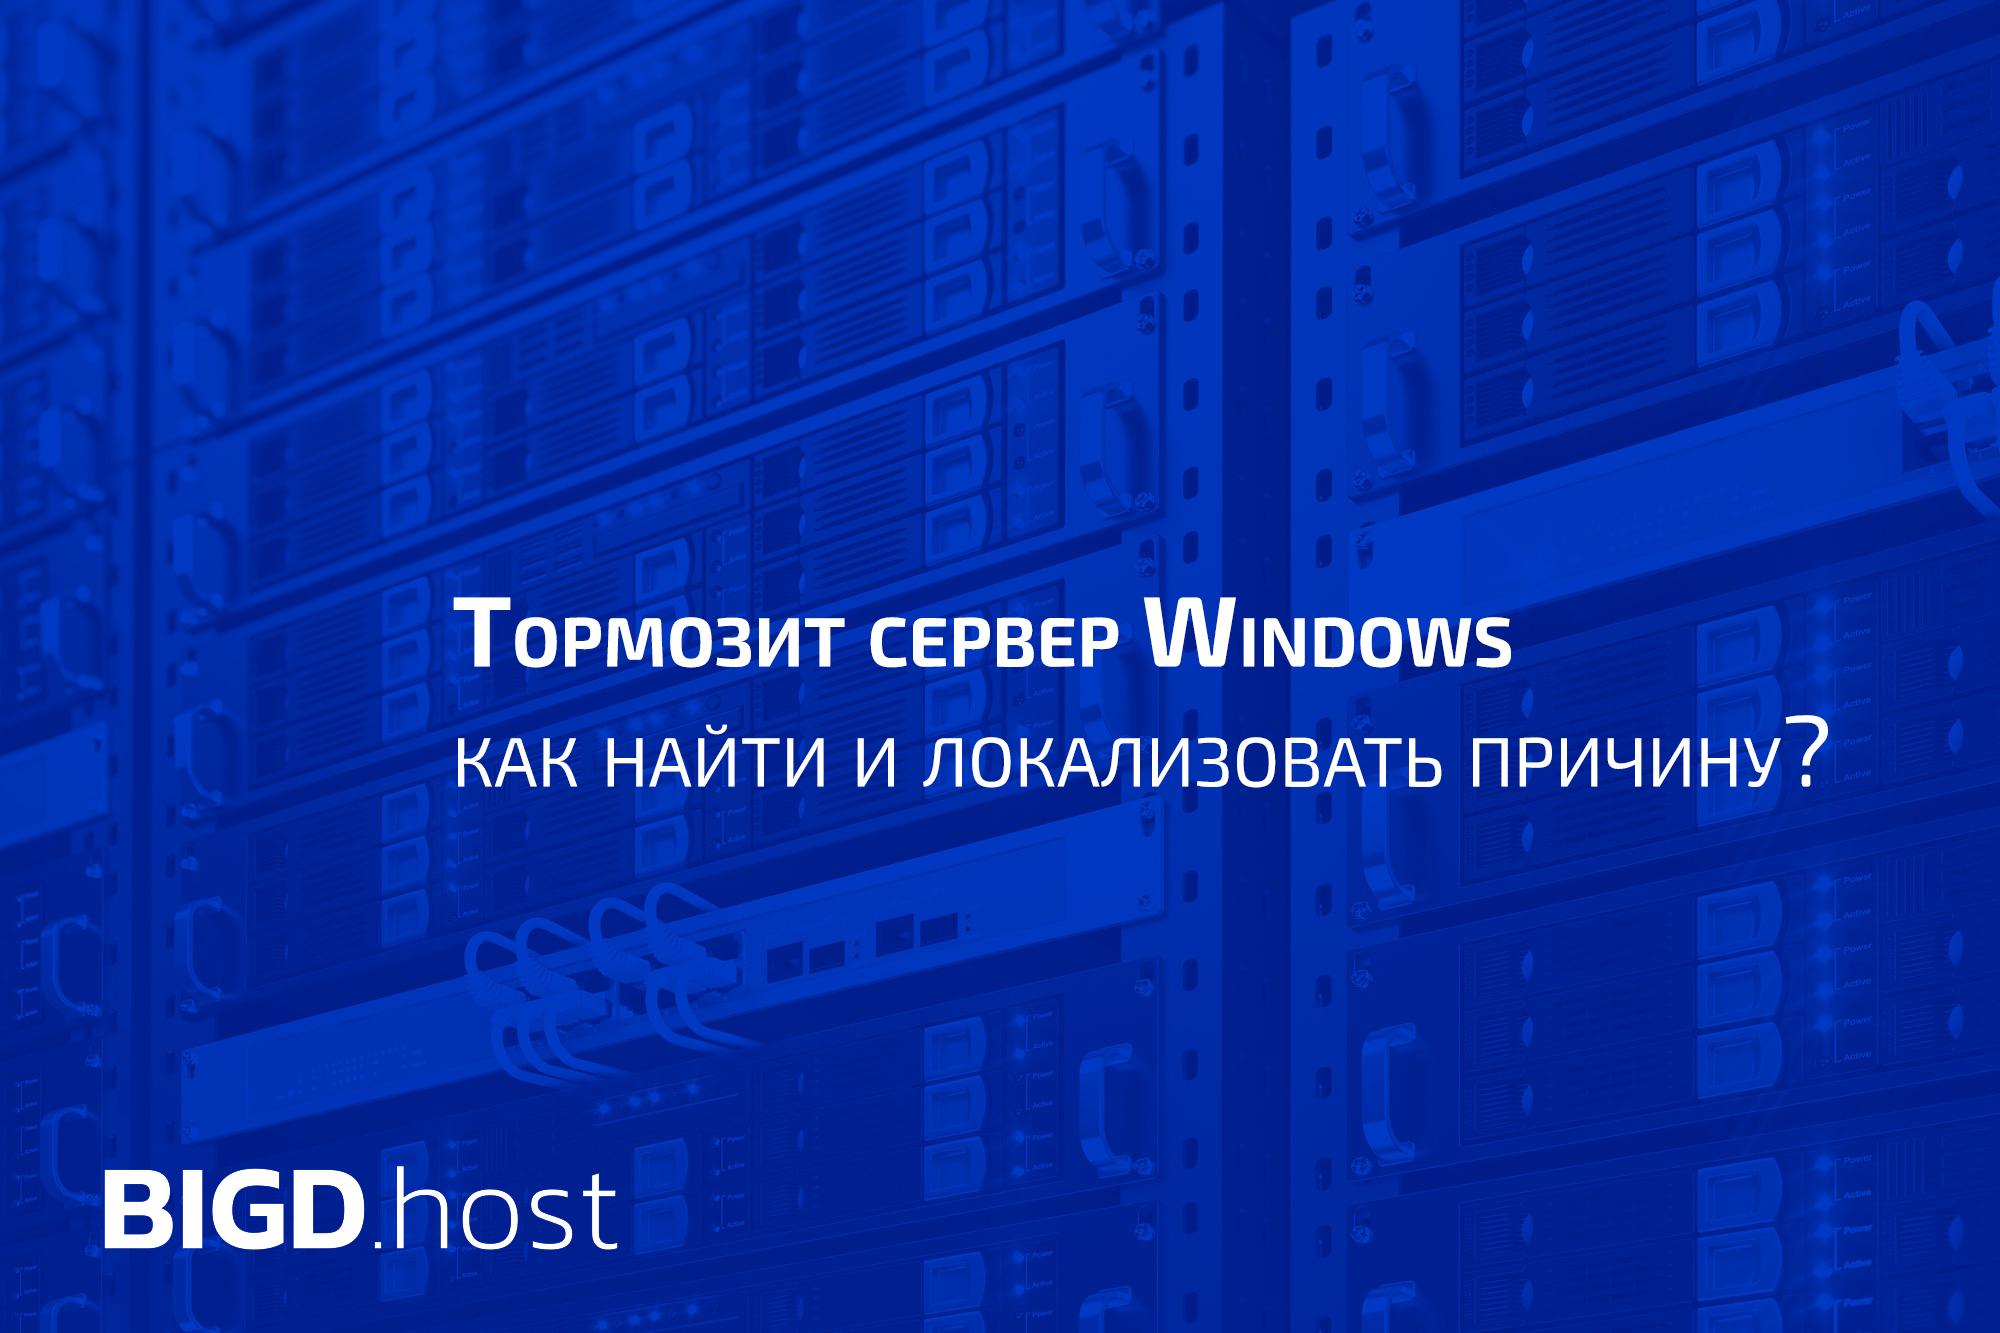 Тормозит сервер Windows найти причину